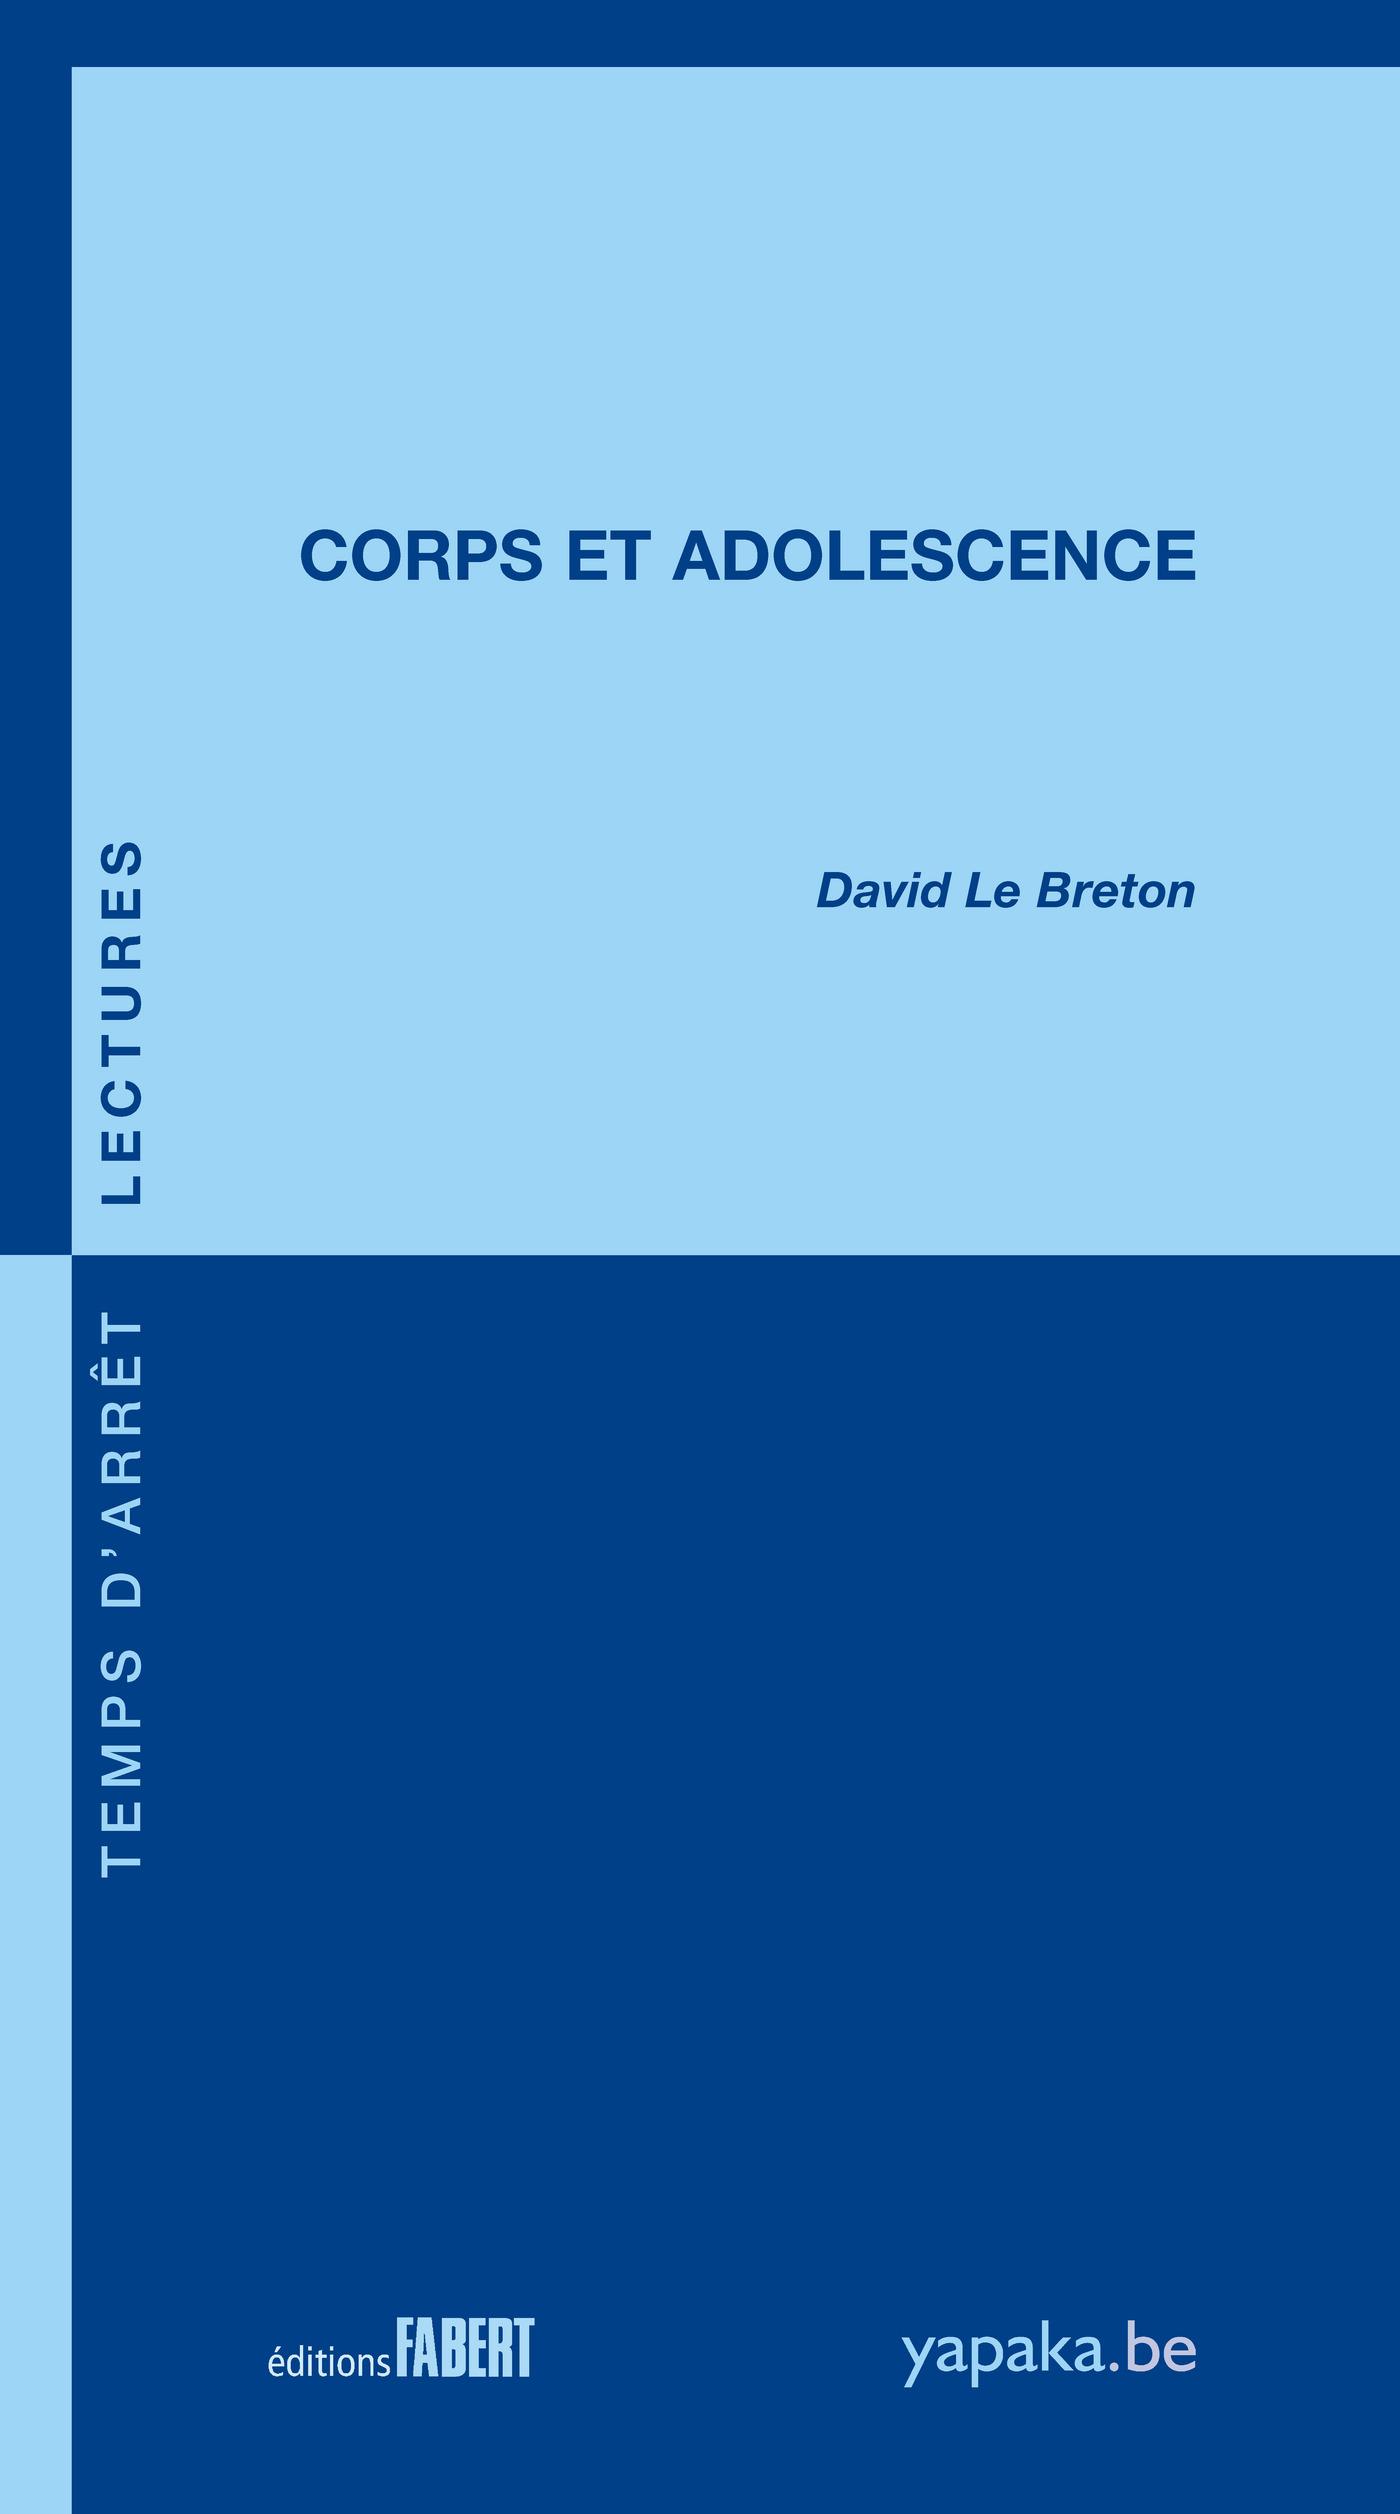 Corps et adolescence